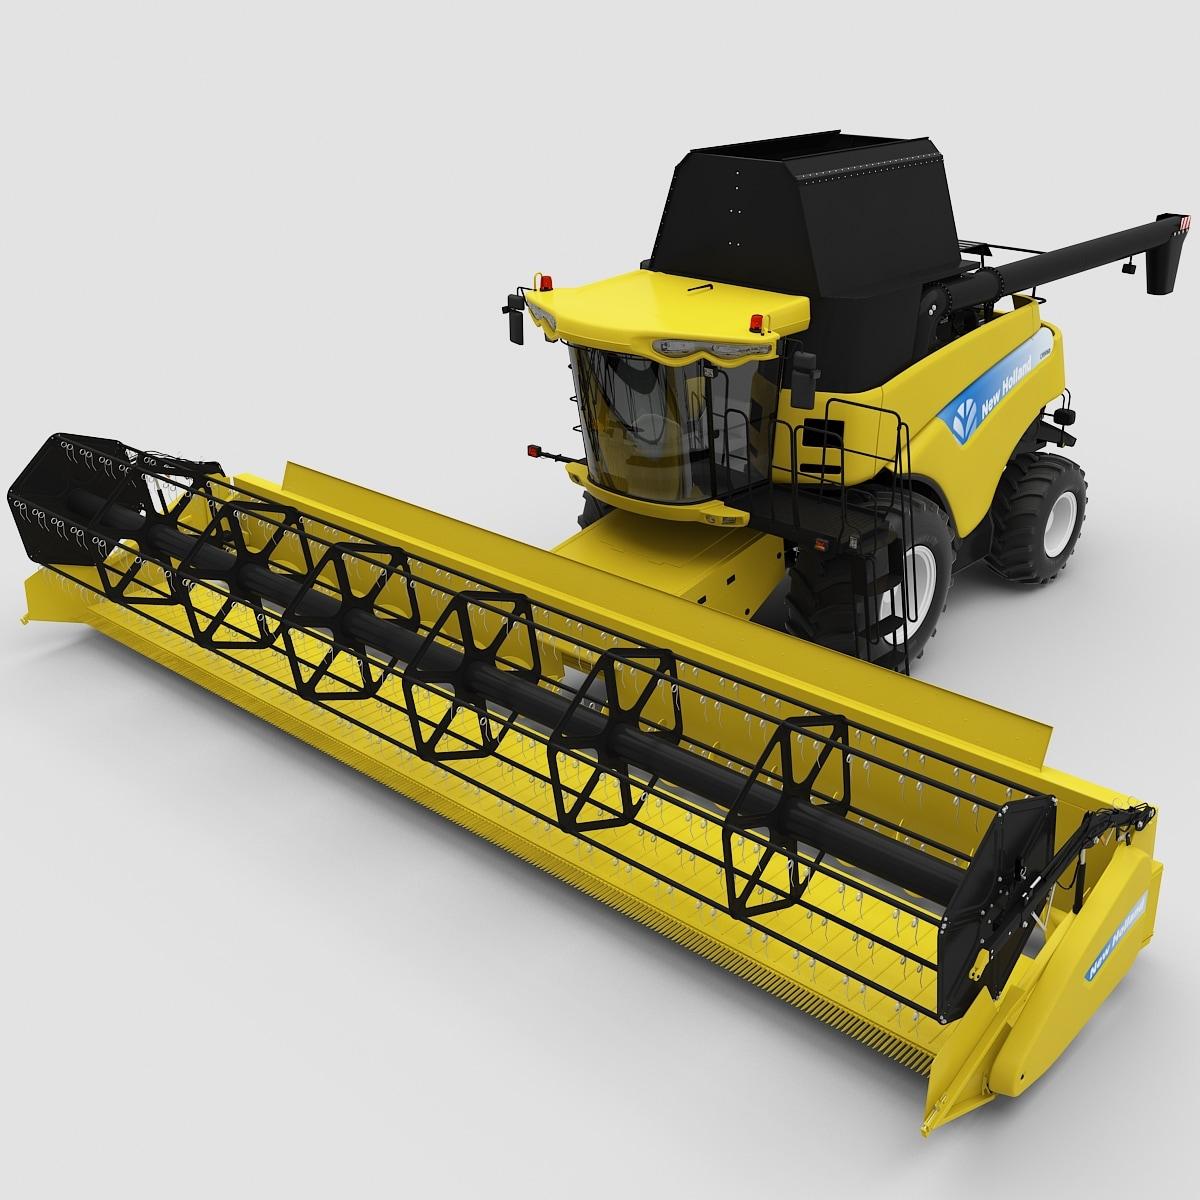 New_Holland_CR9000_Twin_Rotor_Combine_V2_001.jpg